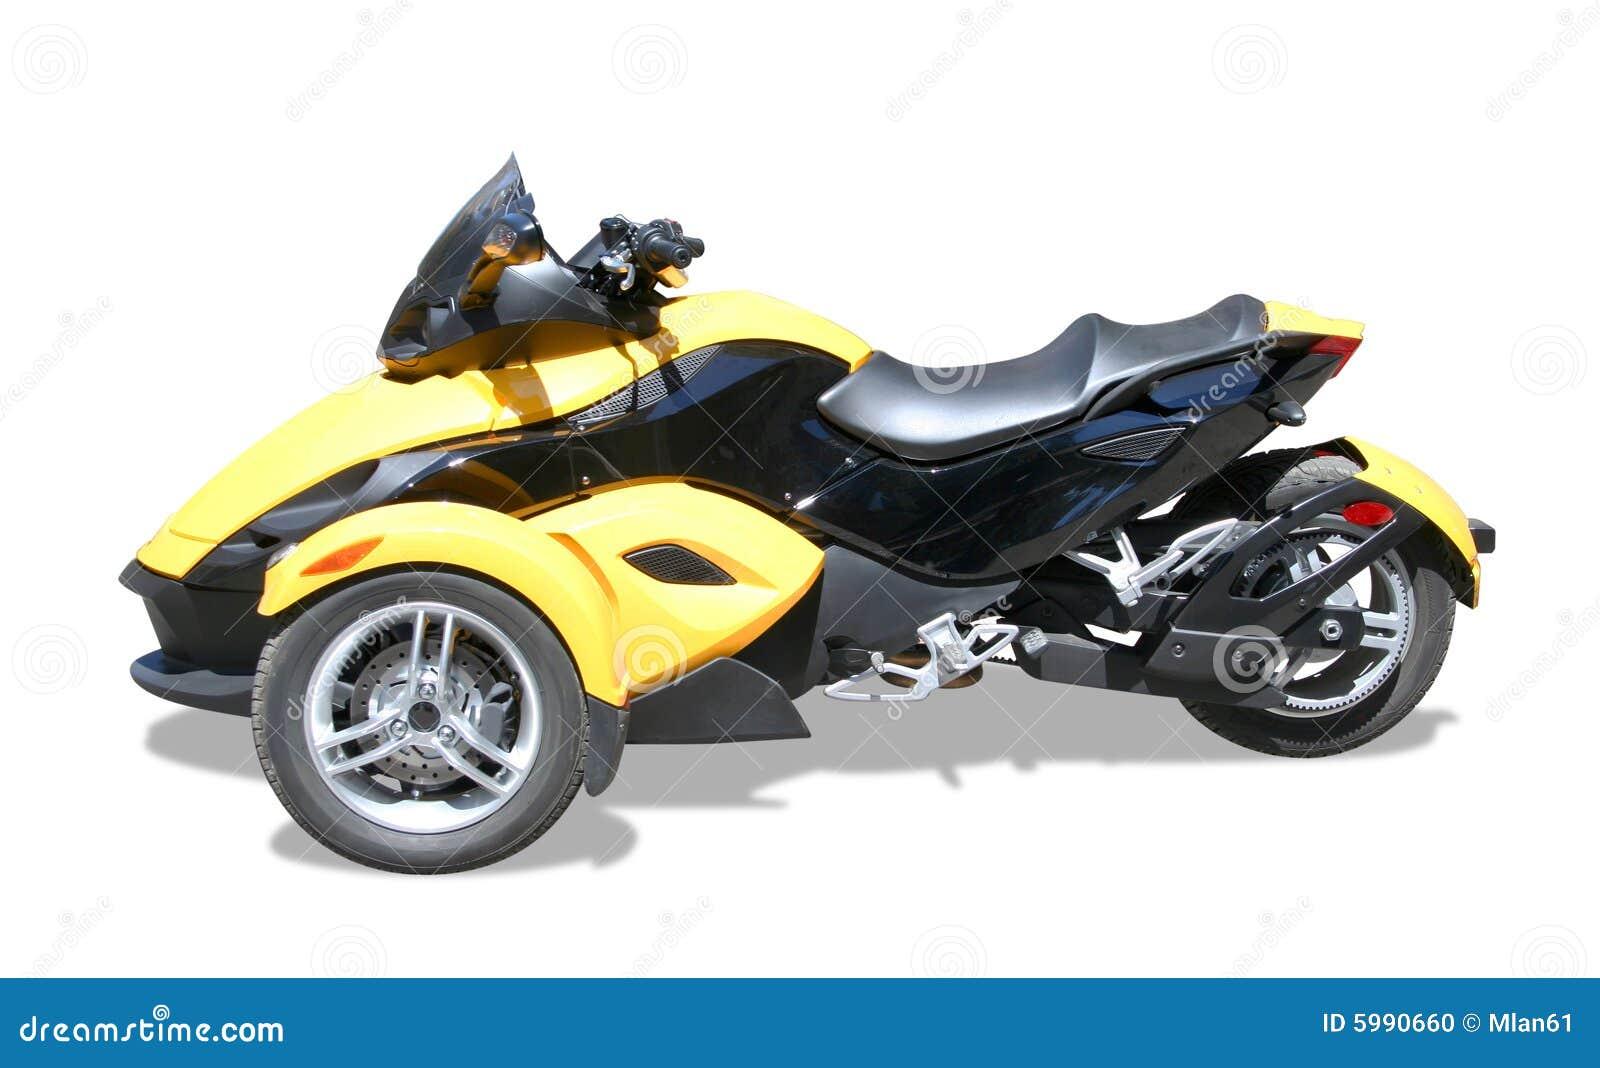 Three wheel motorcycle stock photo image 5990660 for Three wheel motor bike in india